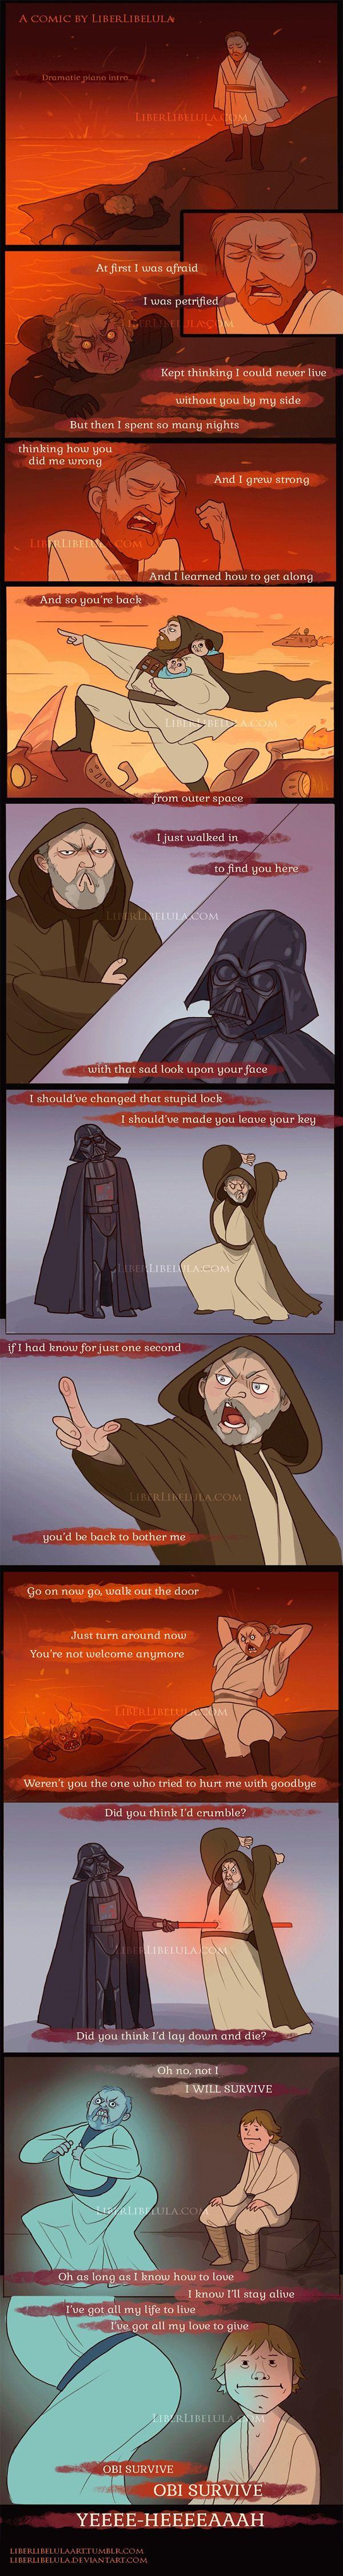 Obi Never Fully Dies, Obi Always Survives (By LiberLibelula)